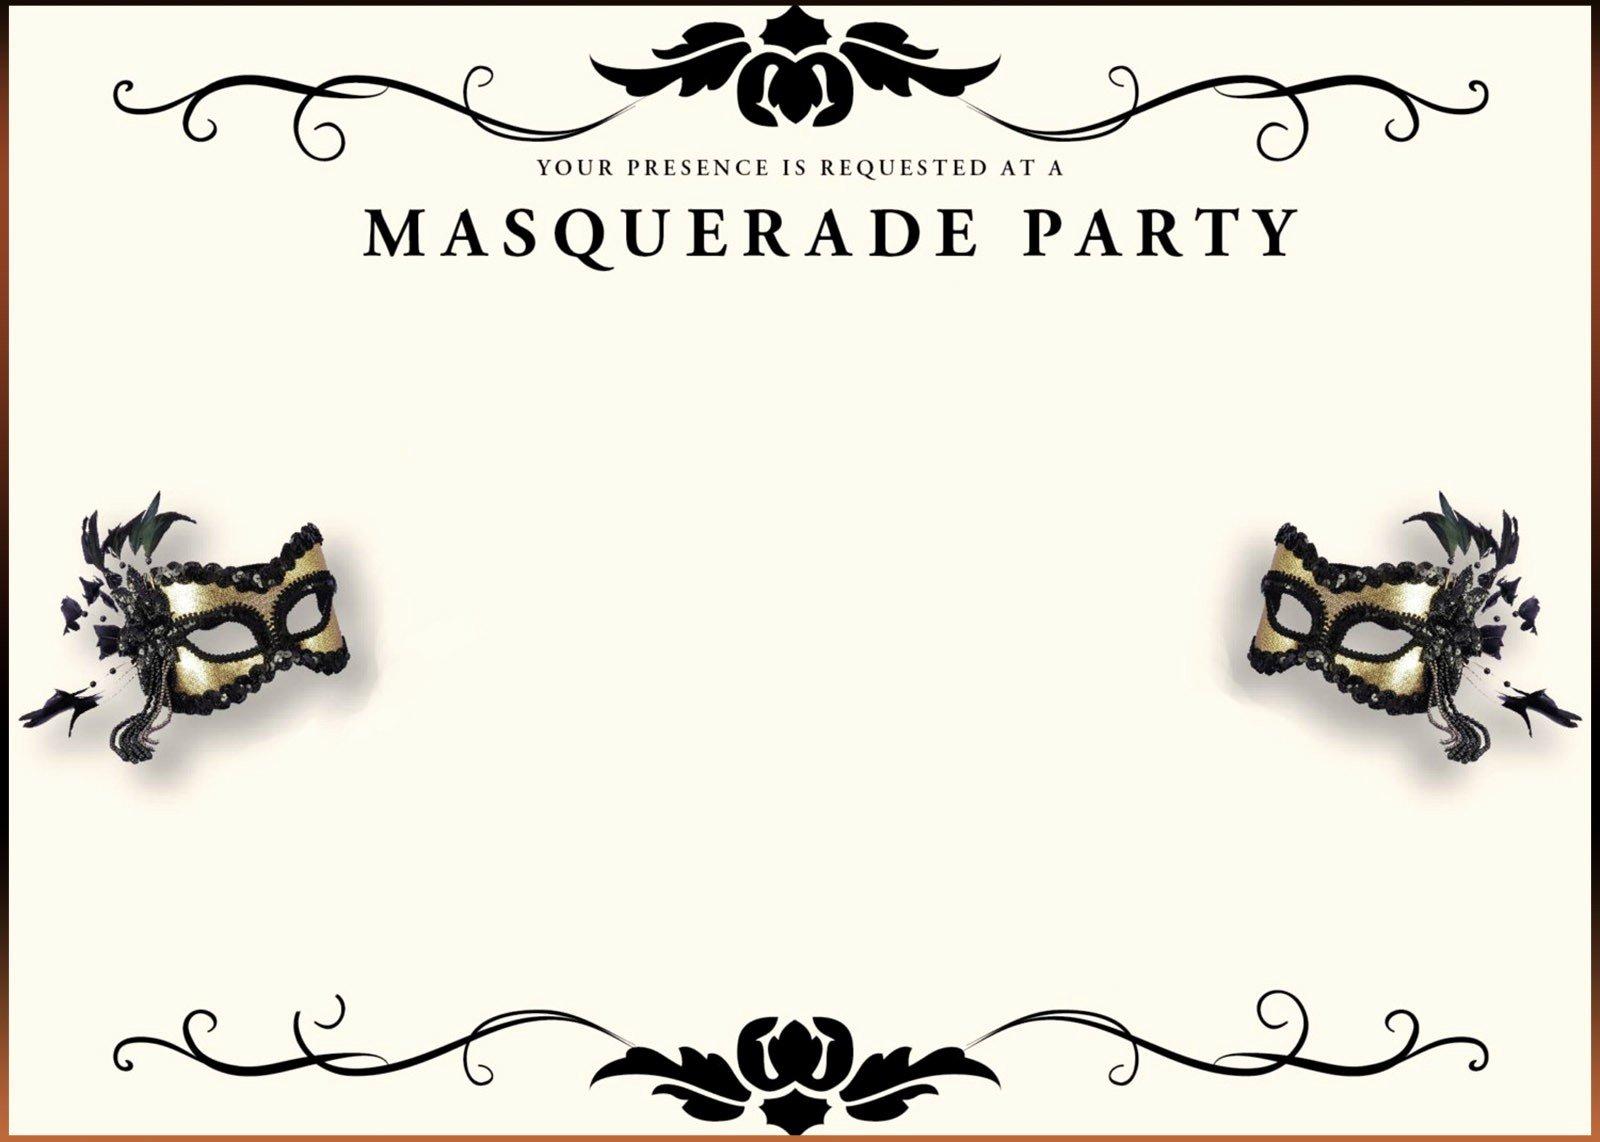 Masquerade Invitations Templates Free Luxury Free Printable Masquerade Invitation Templates